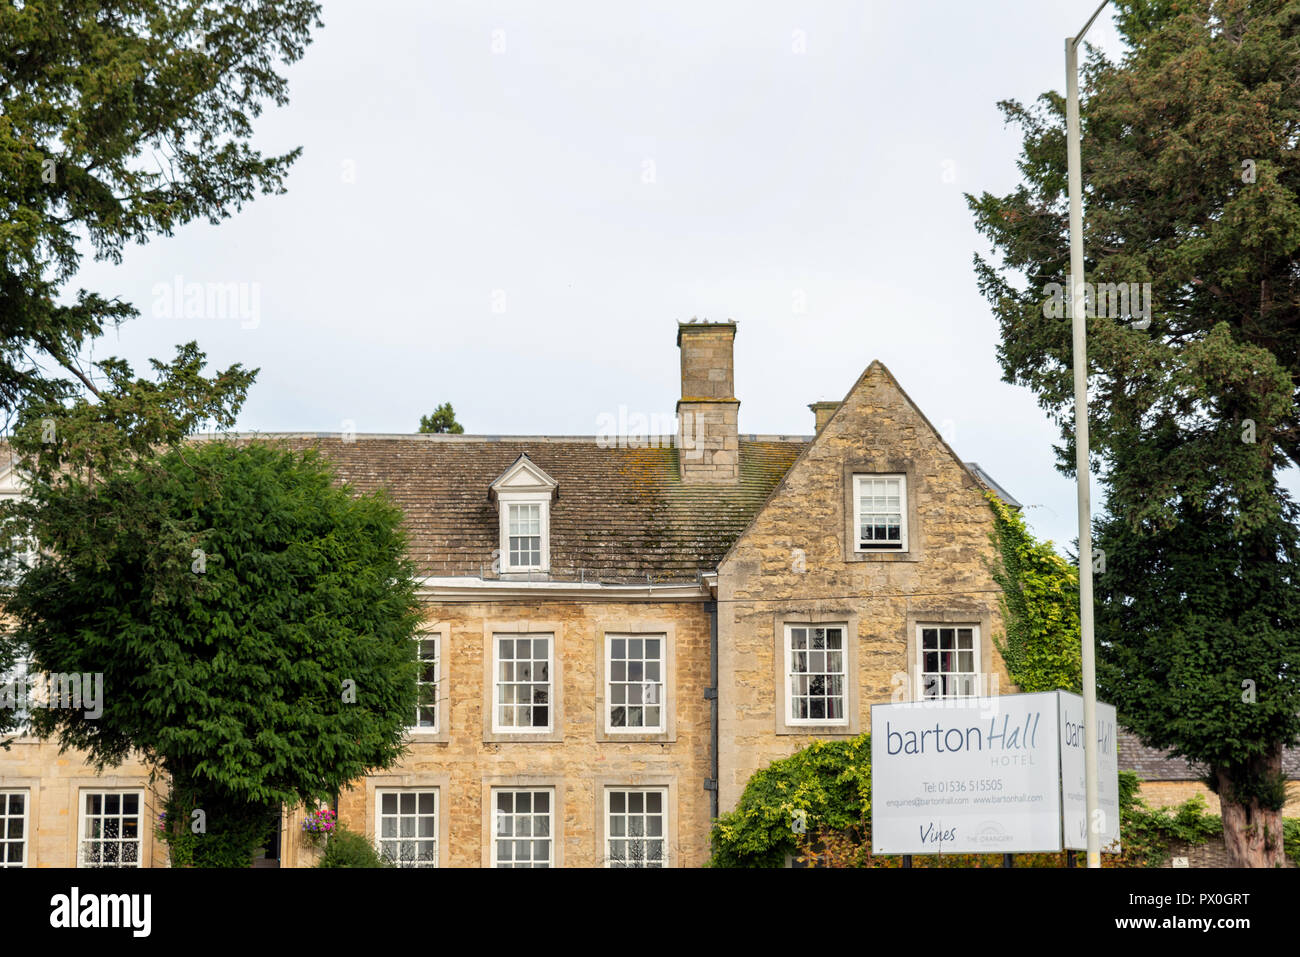 Barton Seagrave, UK - Oct 07 2018: Day view barton seagrave village hall. - Stock Image